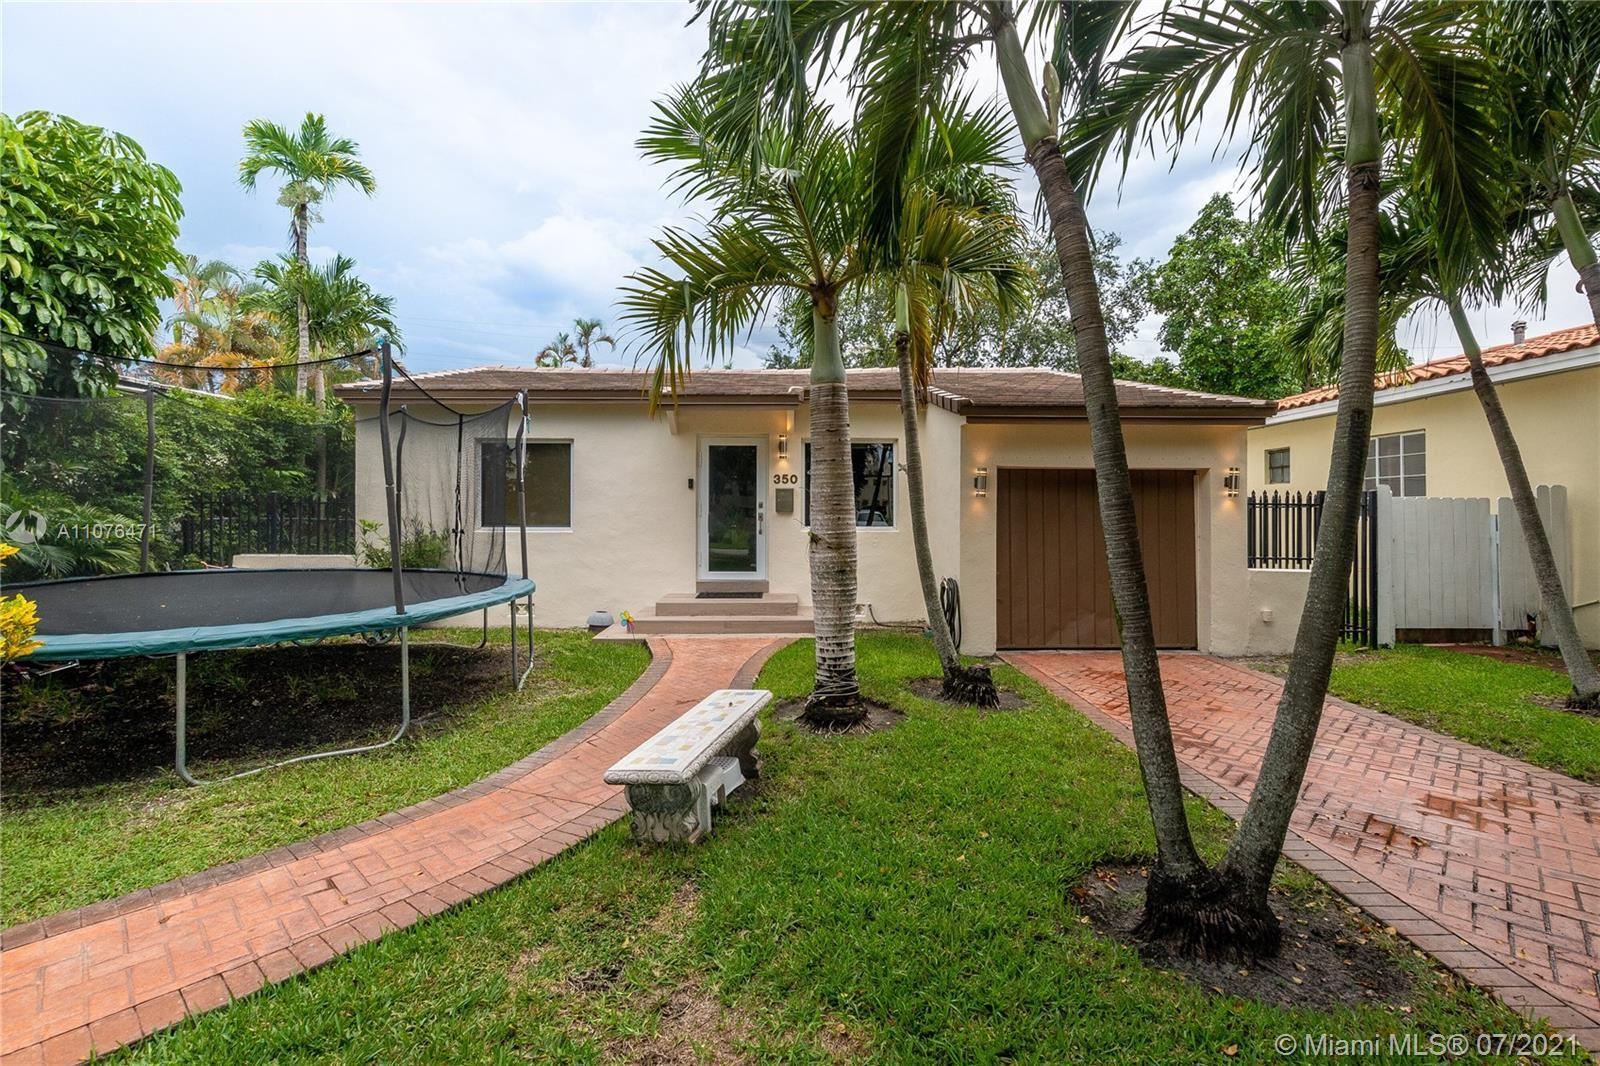 350 Morningside Dr, Miami Springs, FL 33166 - #: A11076471